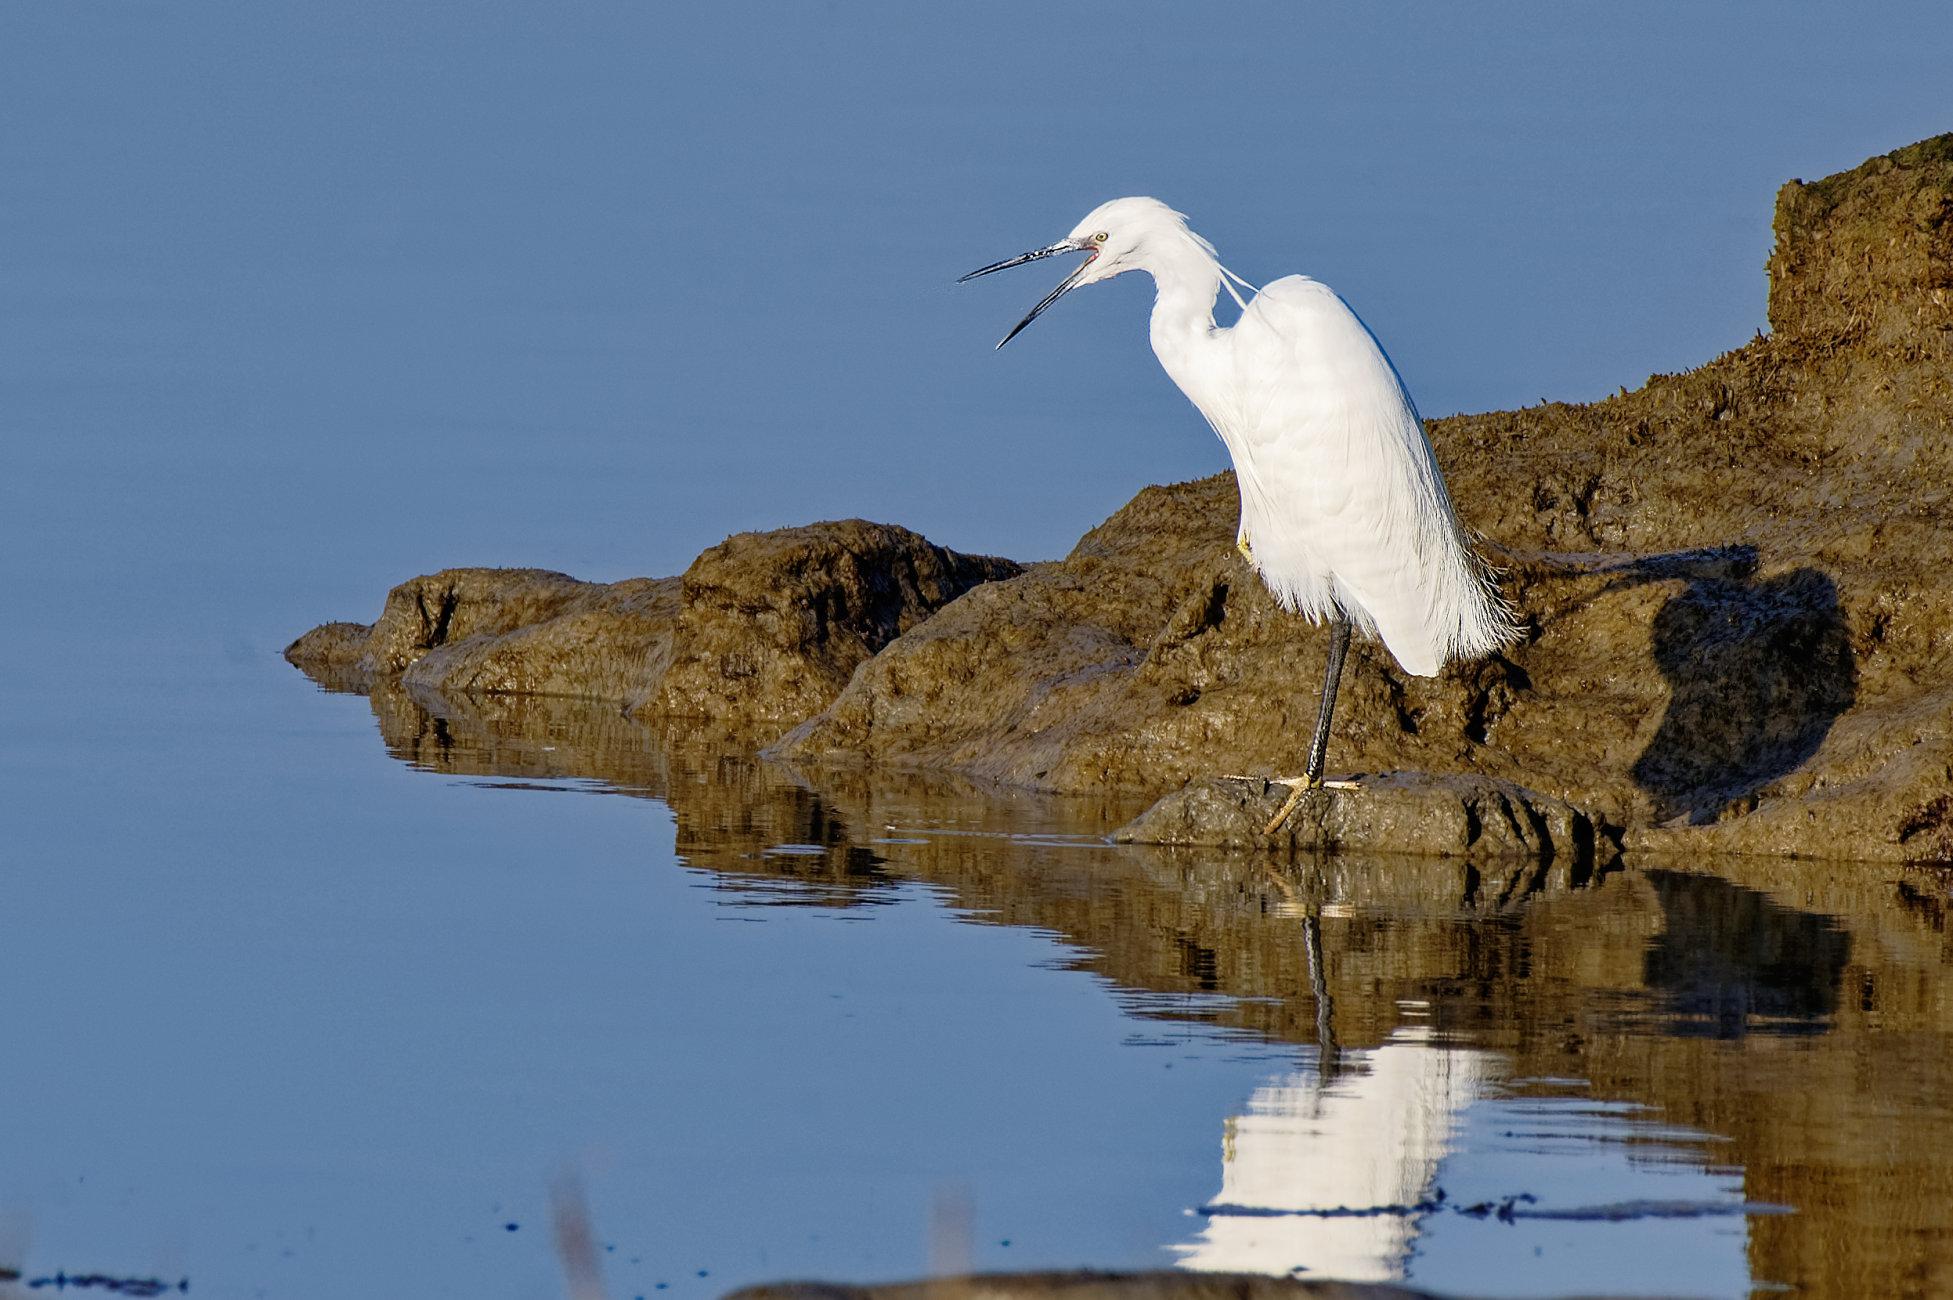 Squawking Egret